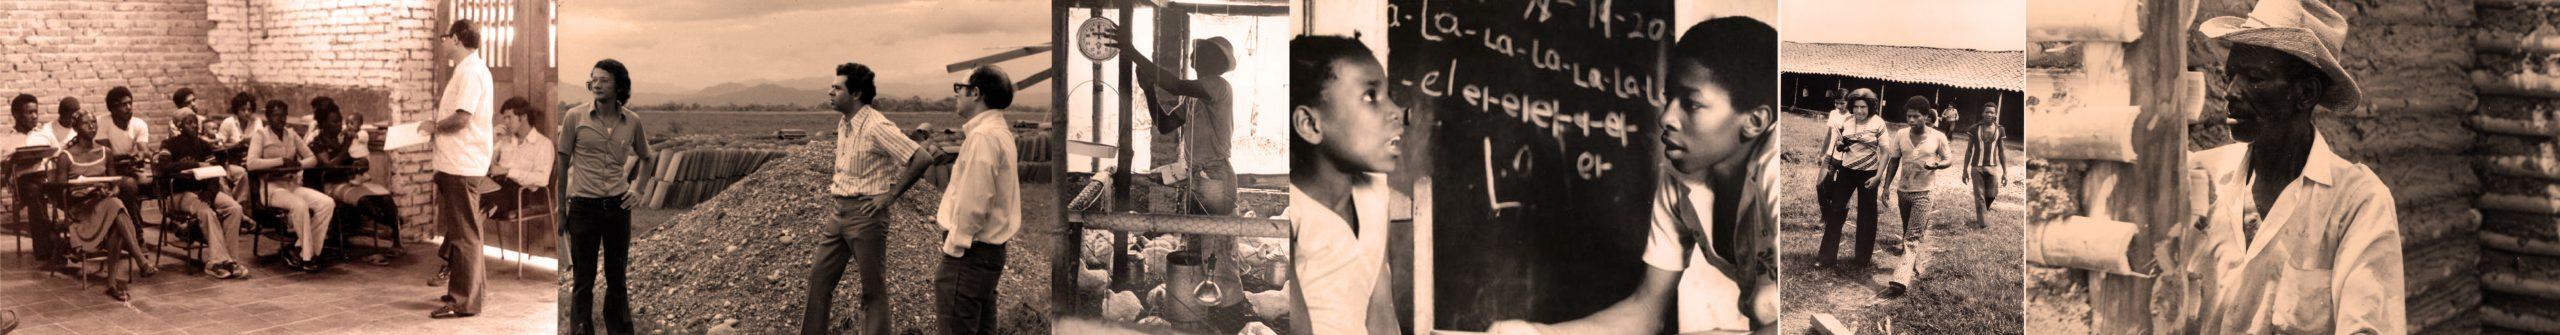 historia-collage-01